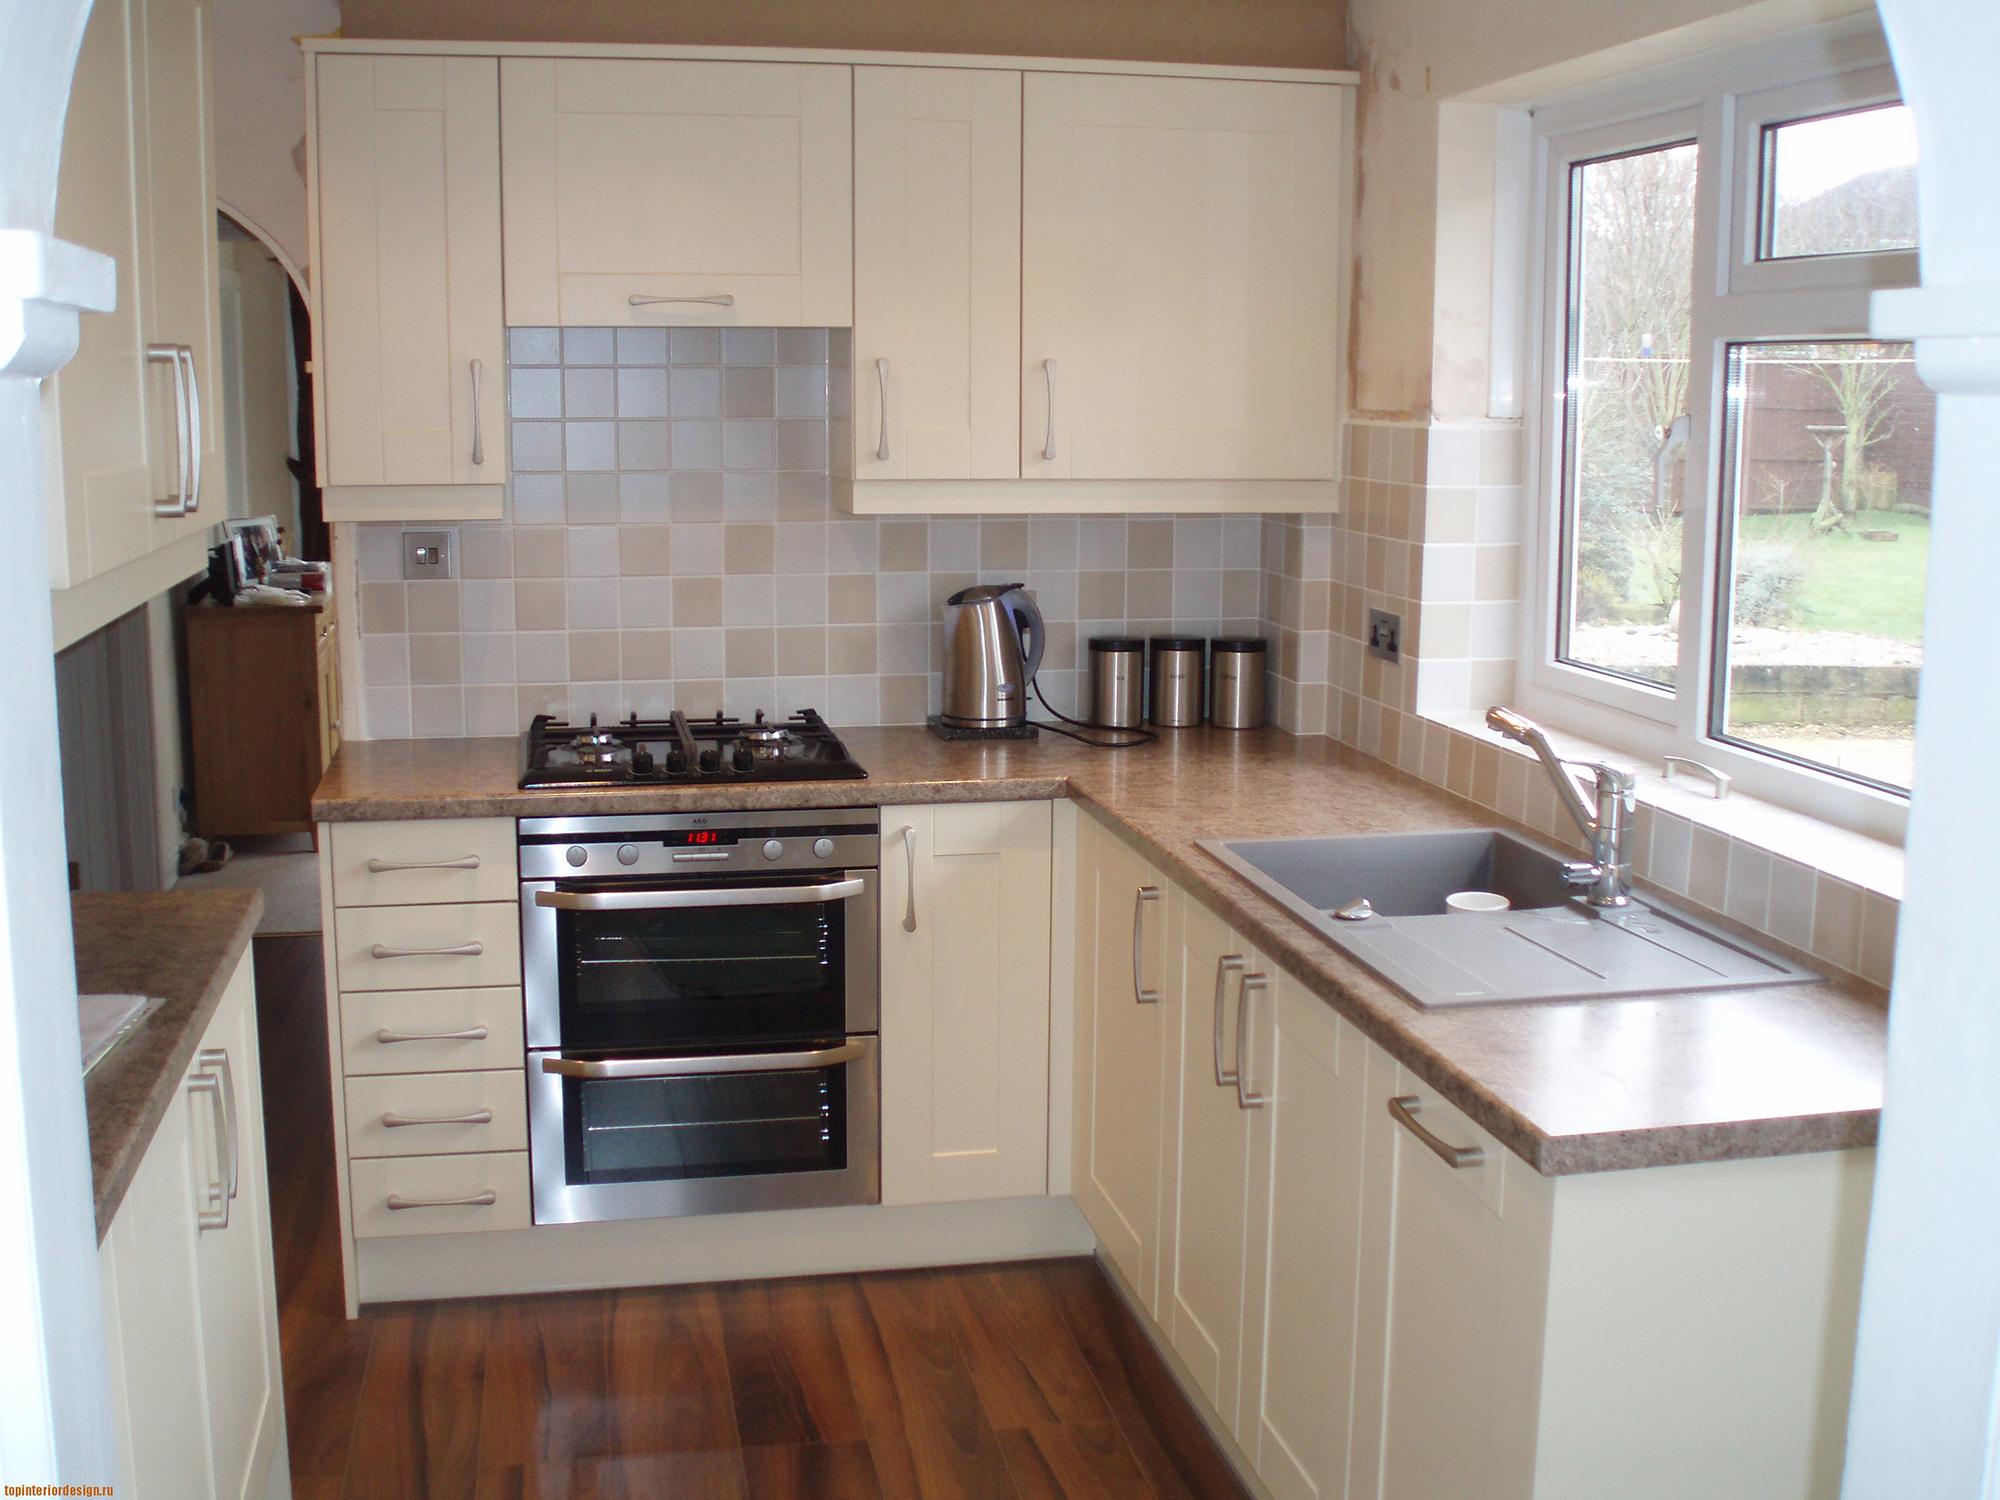 Коричнево-бежевая кухня 8 кв м